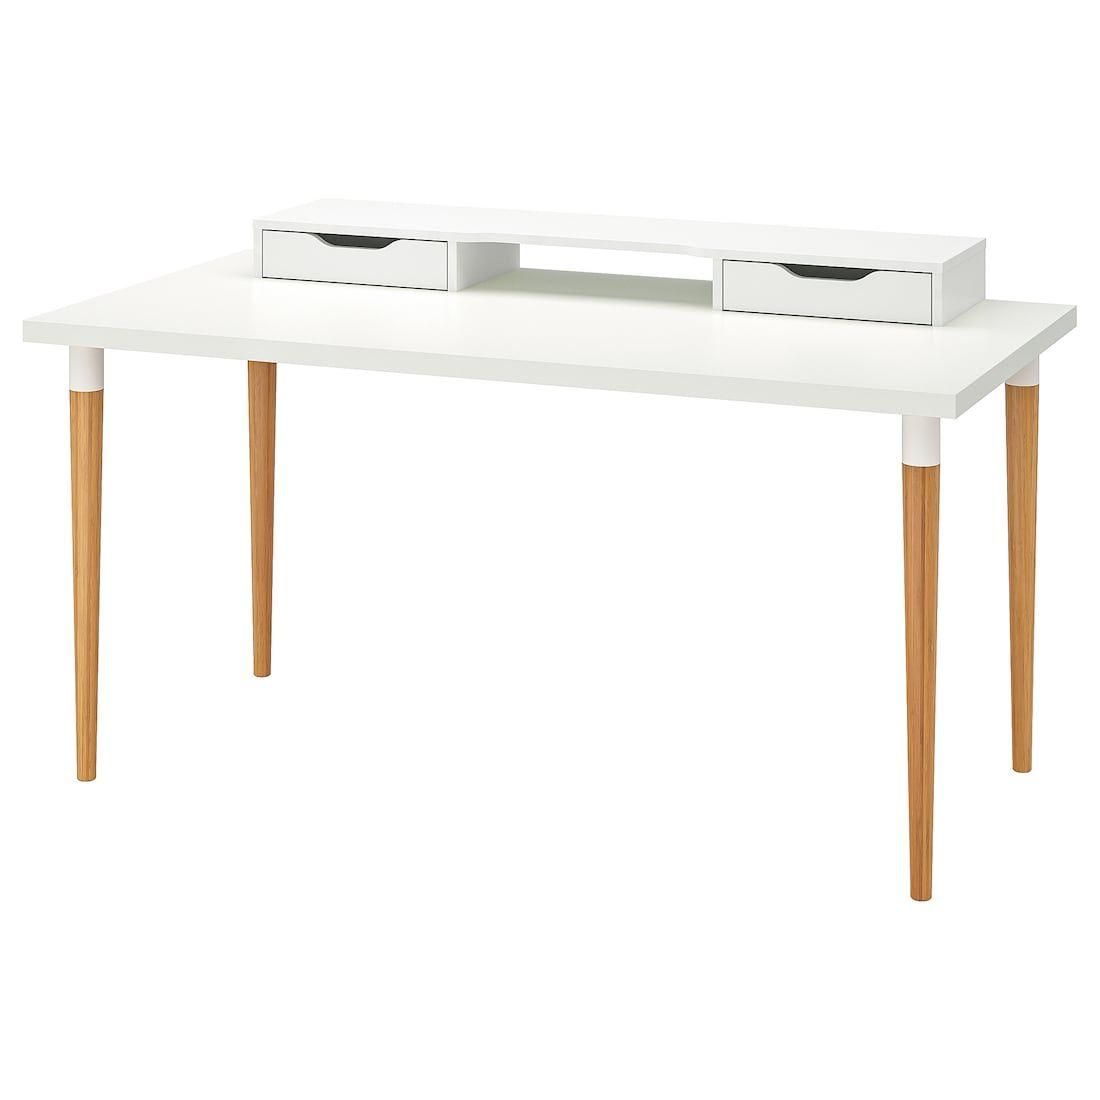 Linnmon Hilver Tafel Wit Bamboe 150x75 Cm Ikea Drawer Shelves Ikea Ikea White Desk